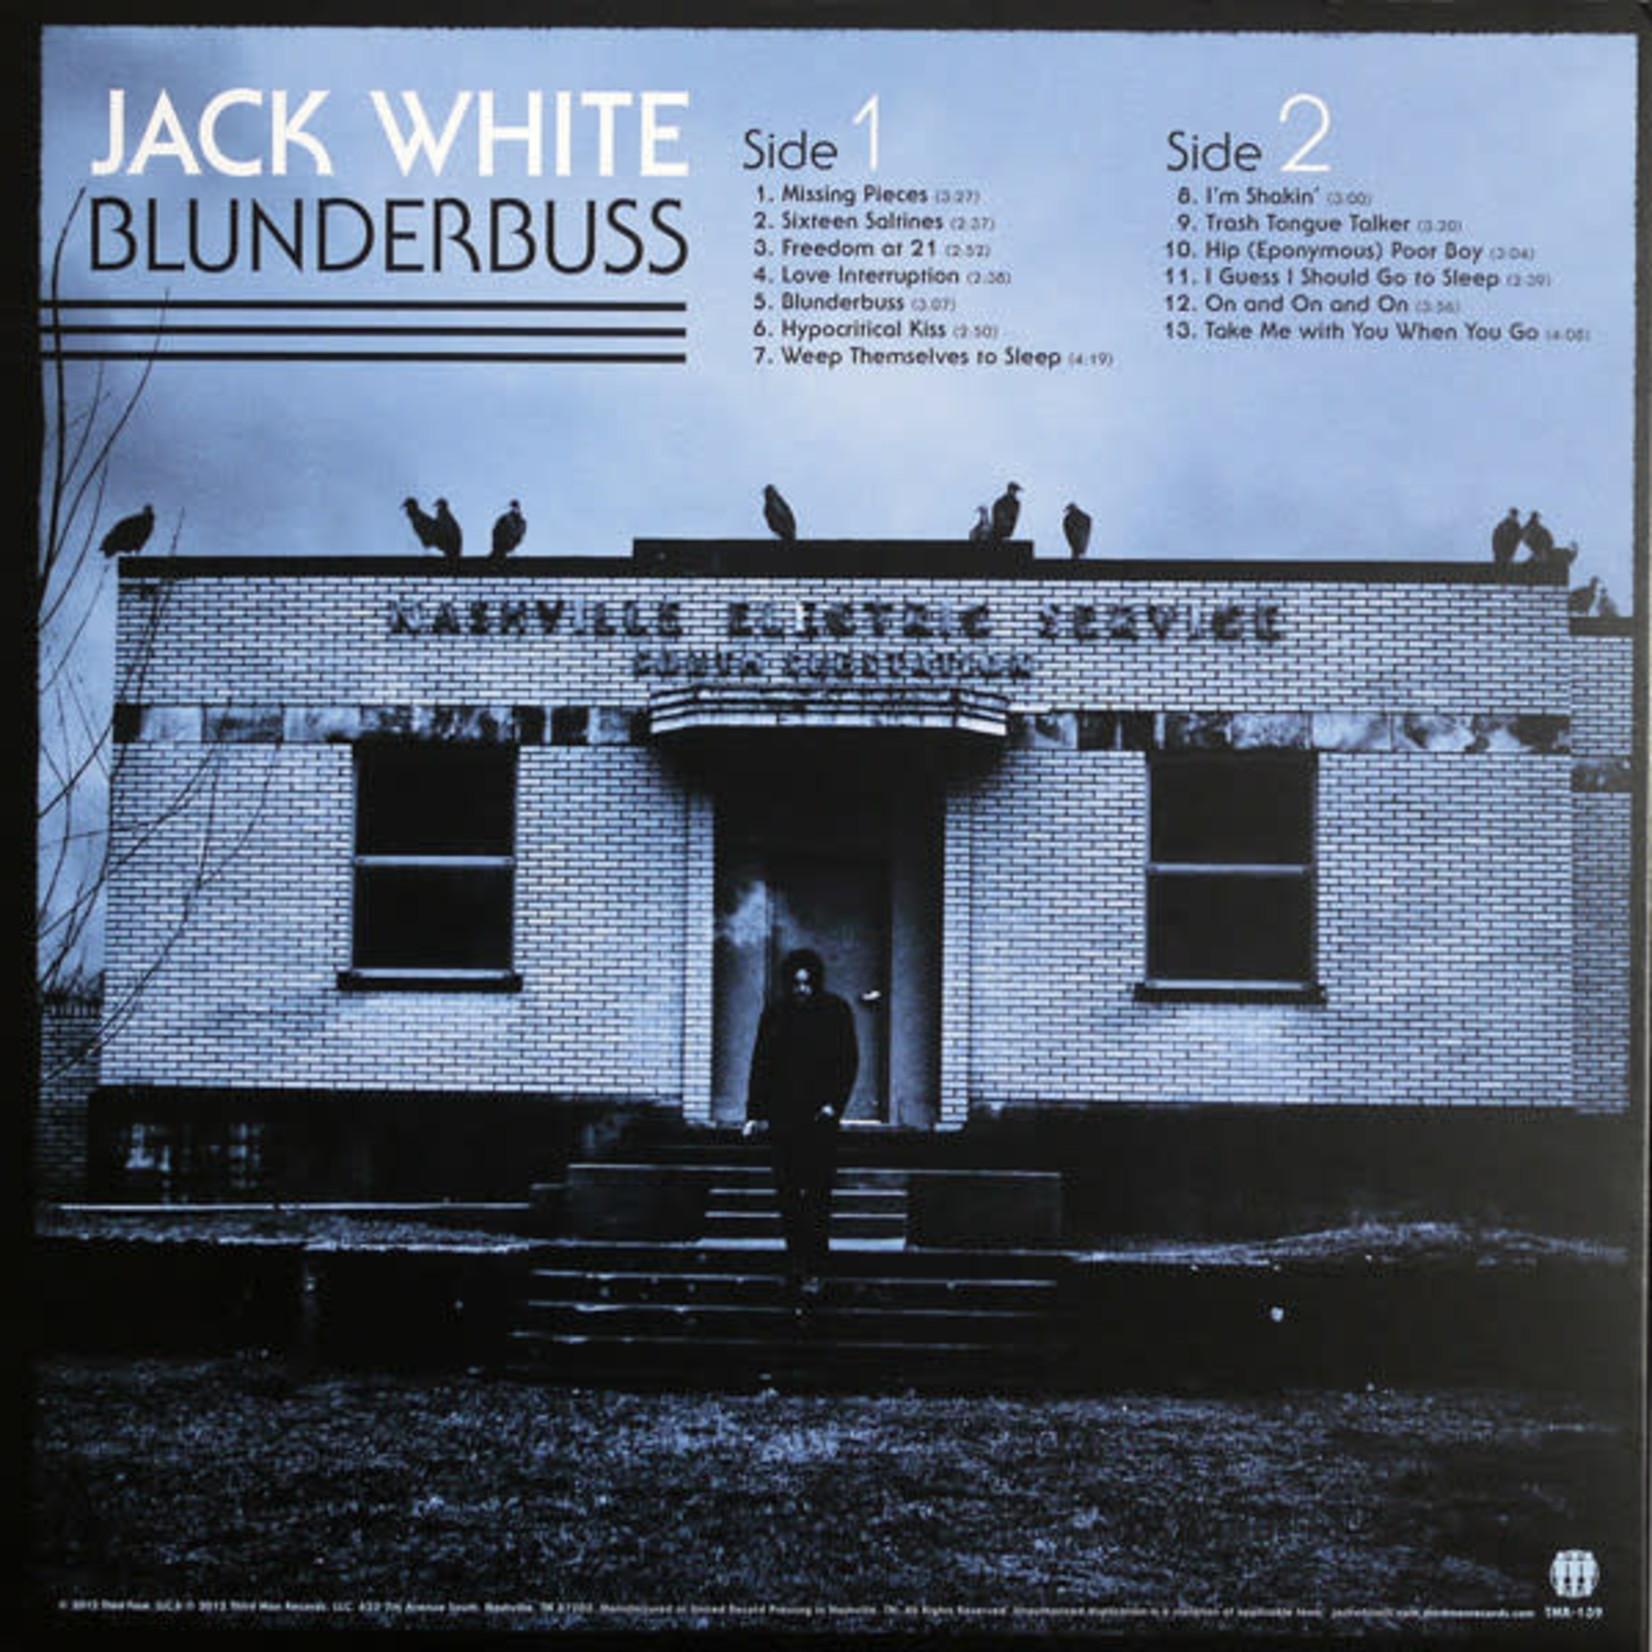 JACK WHITE BLUNDERBUSS